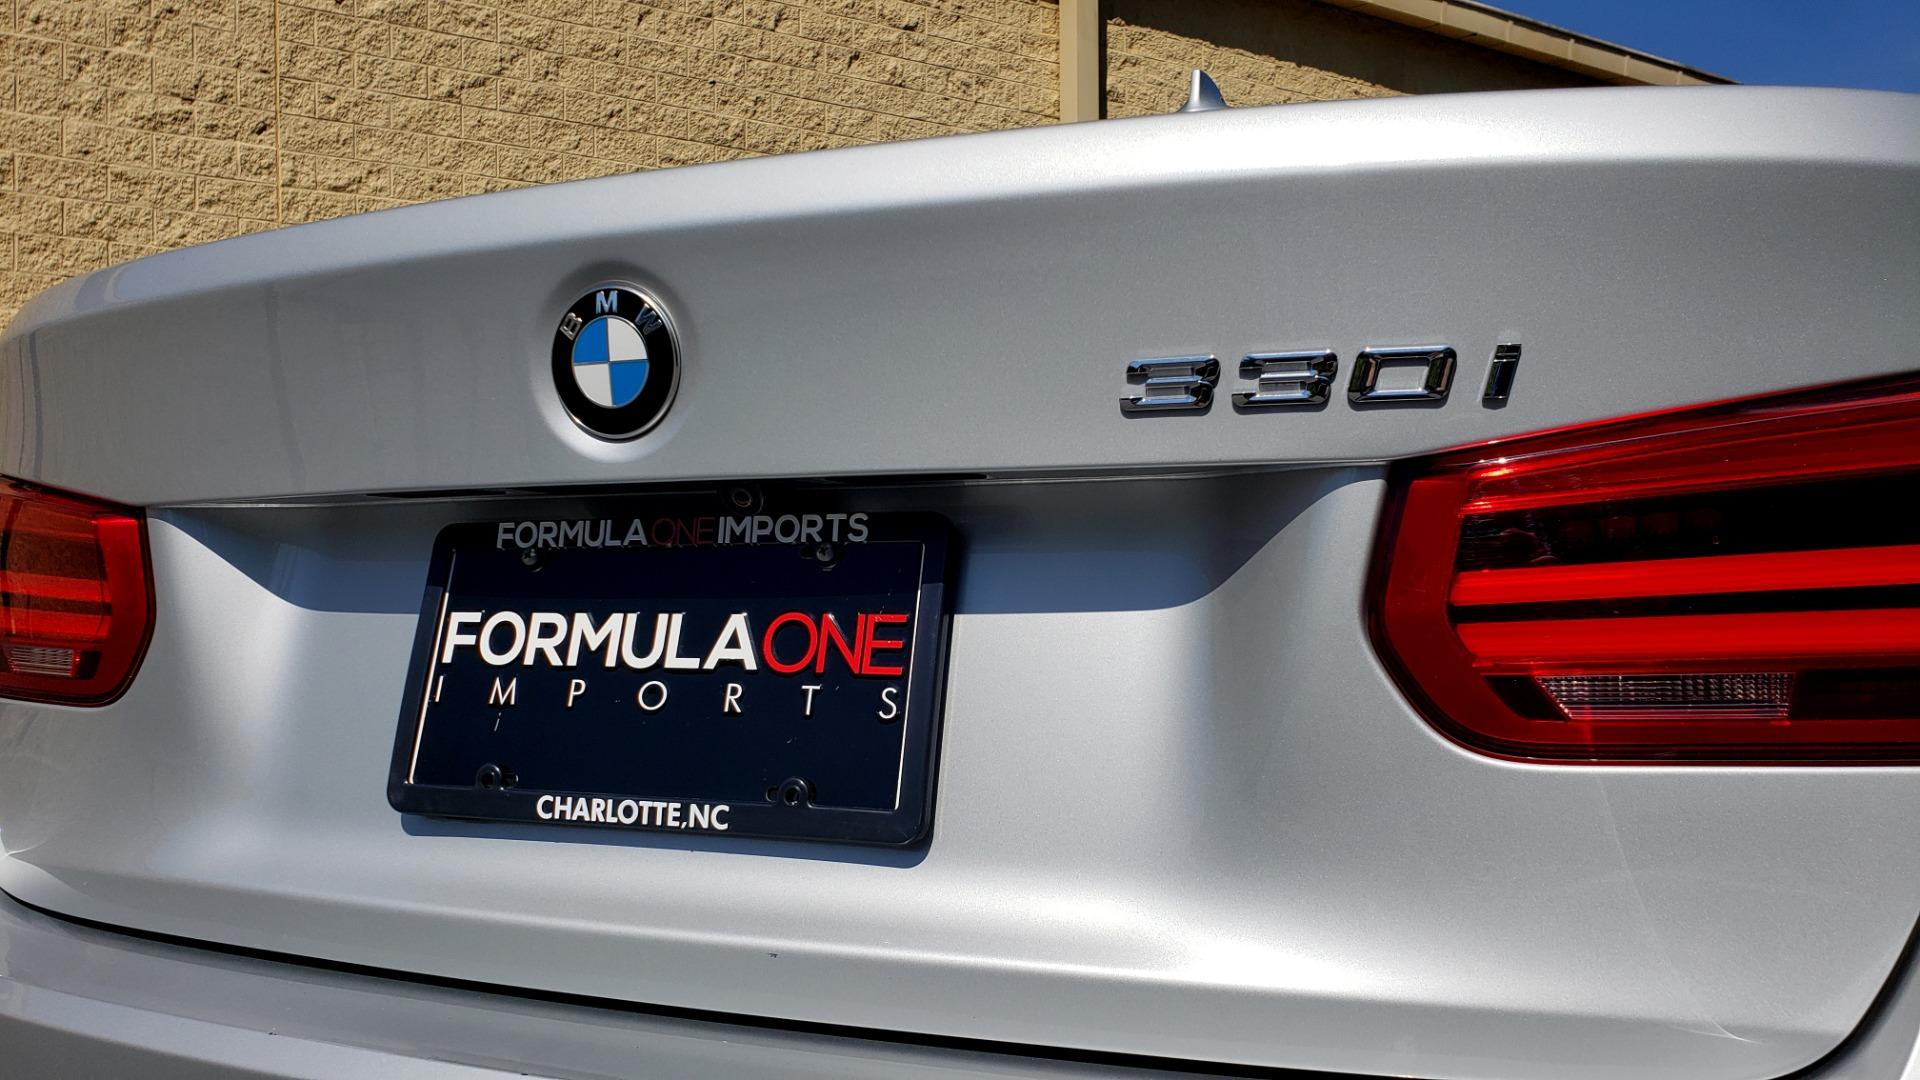 Used 2017 BMW 3 SERIES 330I SPORT SEDAN / DRVR ASST PKG / SUNROOF / REARVIEW for sale Sold at Formula Imports in Charlotte NC 28227 27